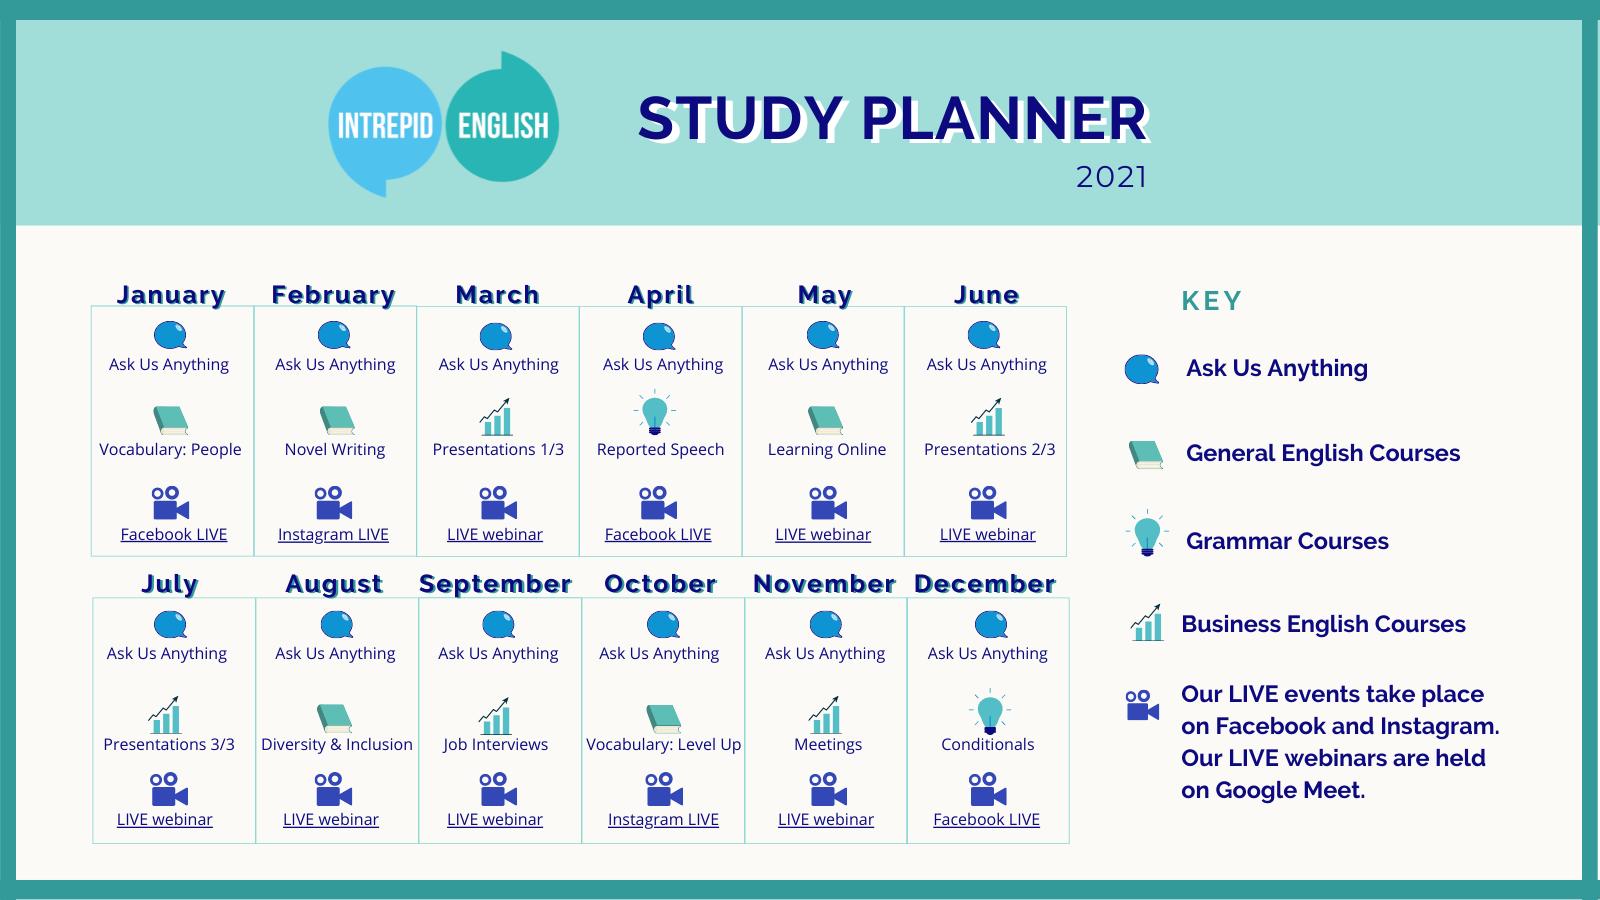 Study Planner 2021